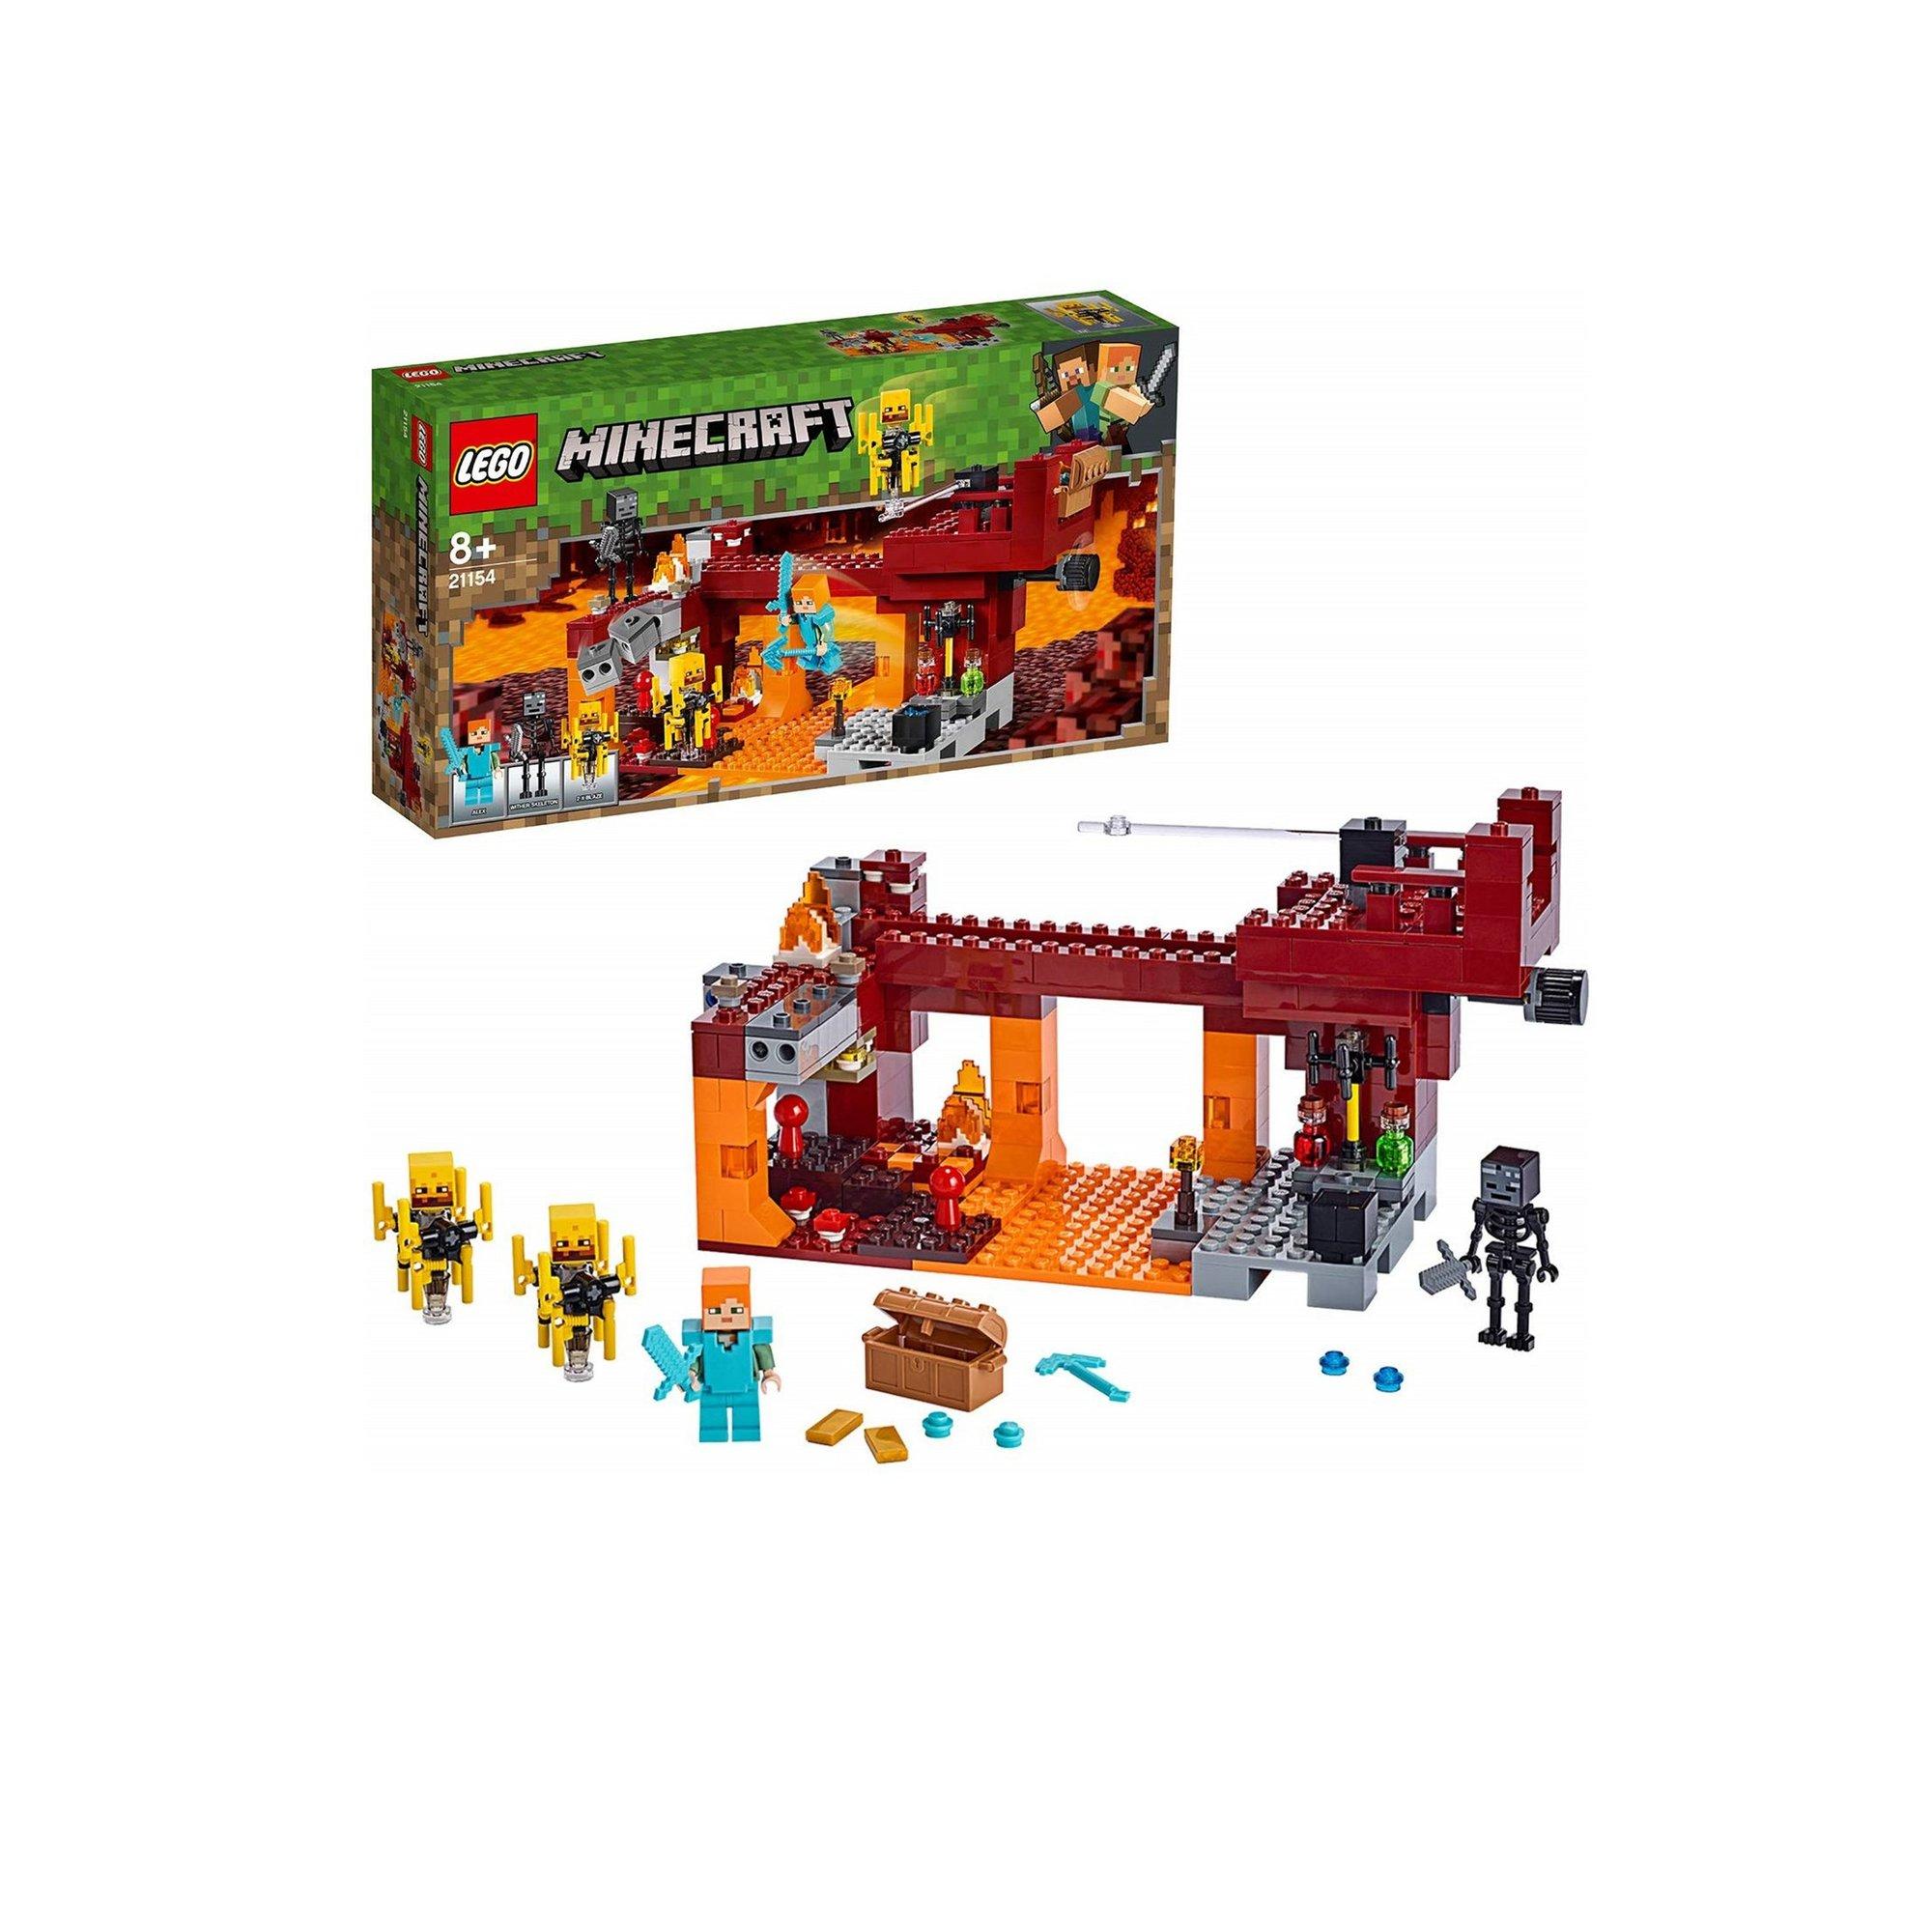 Image of LEGO Minecraft The Blaze Bridge